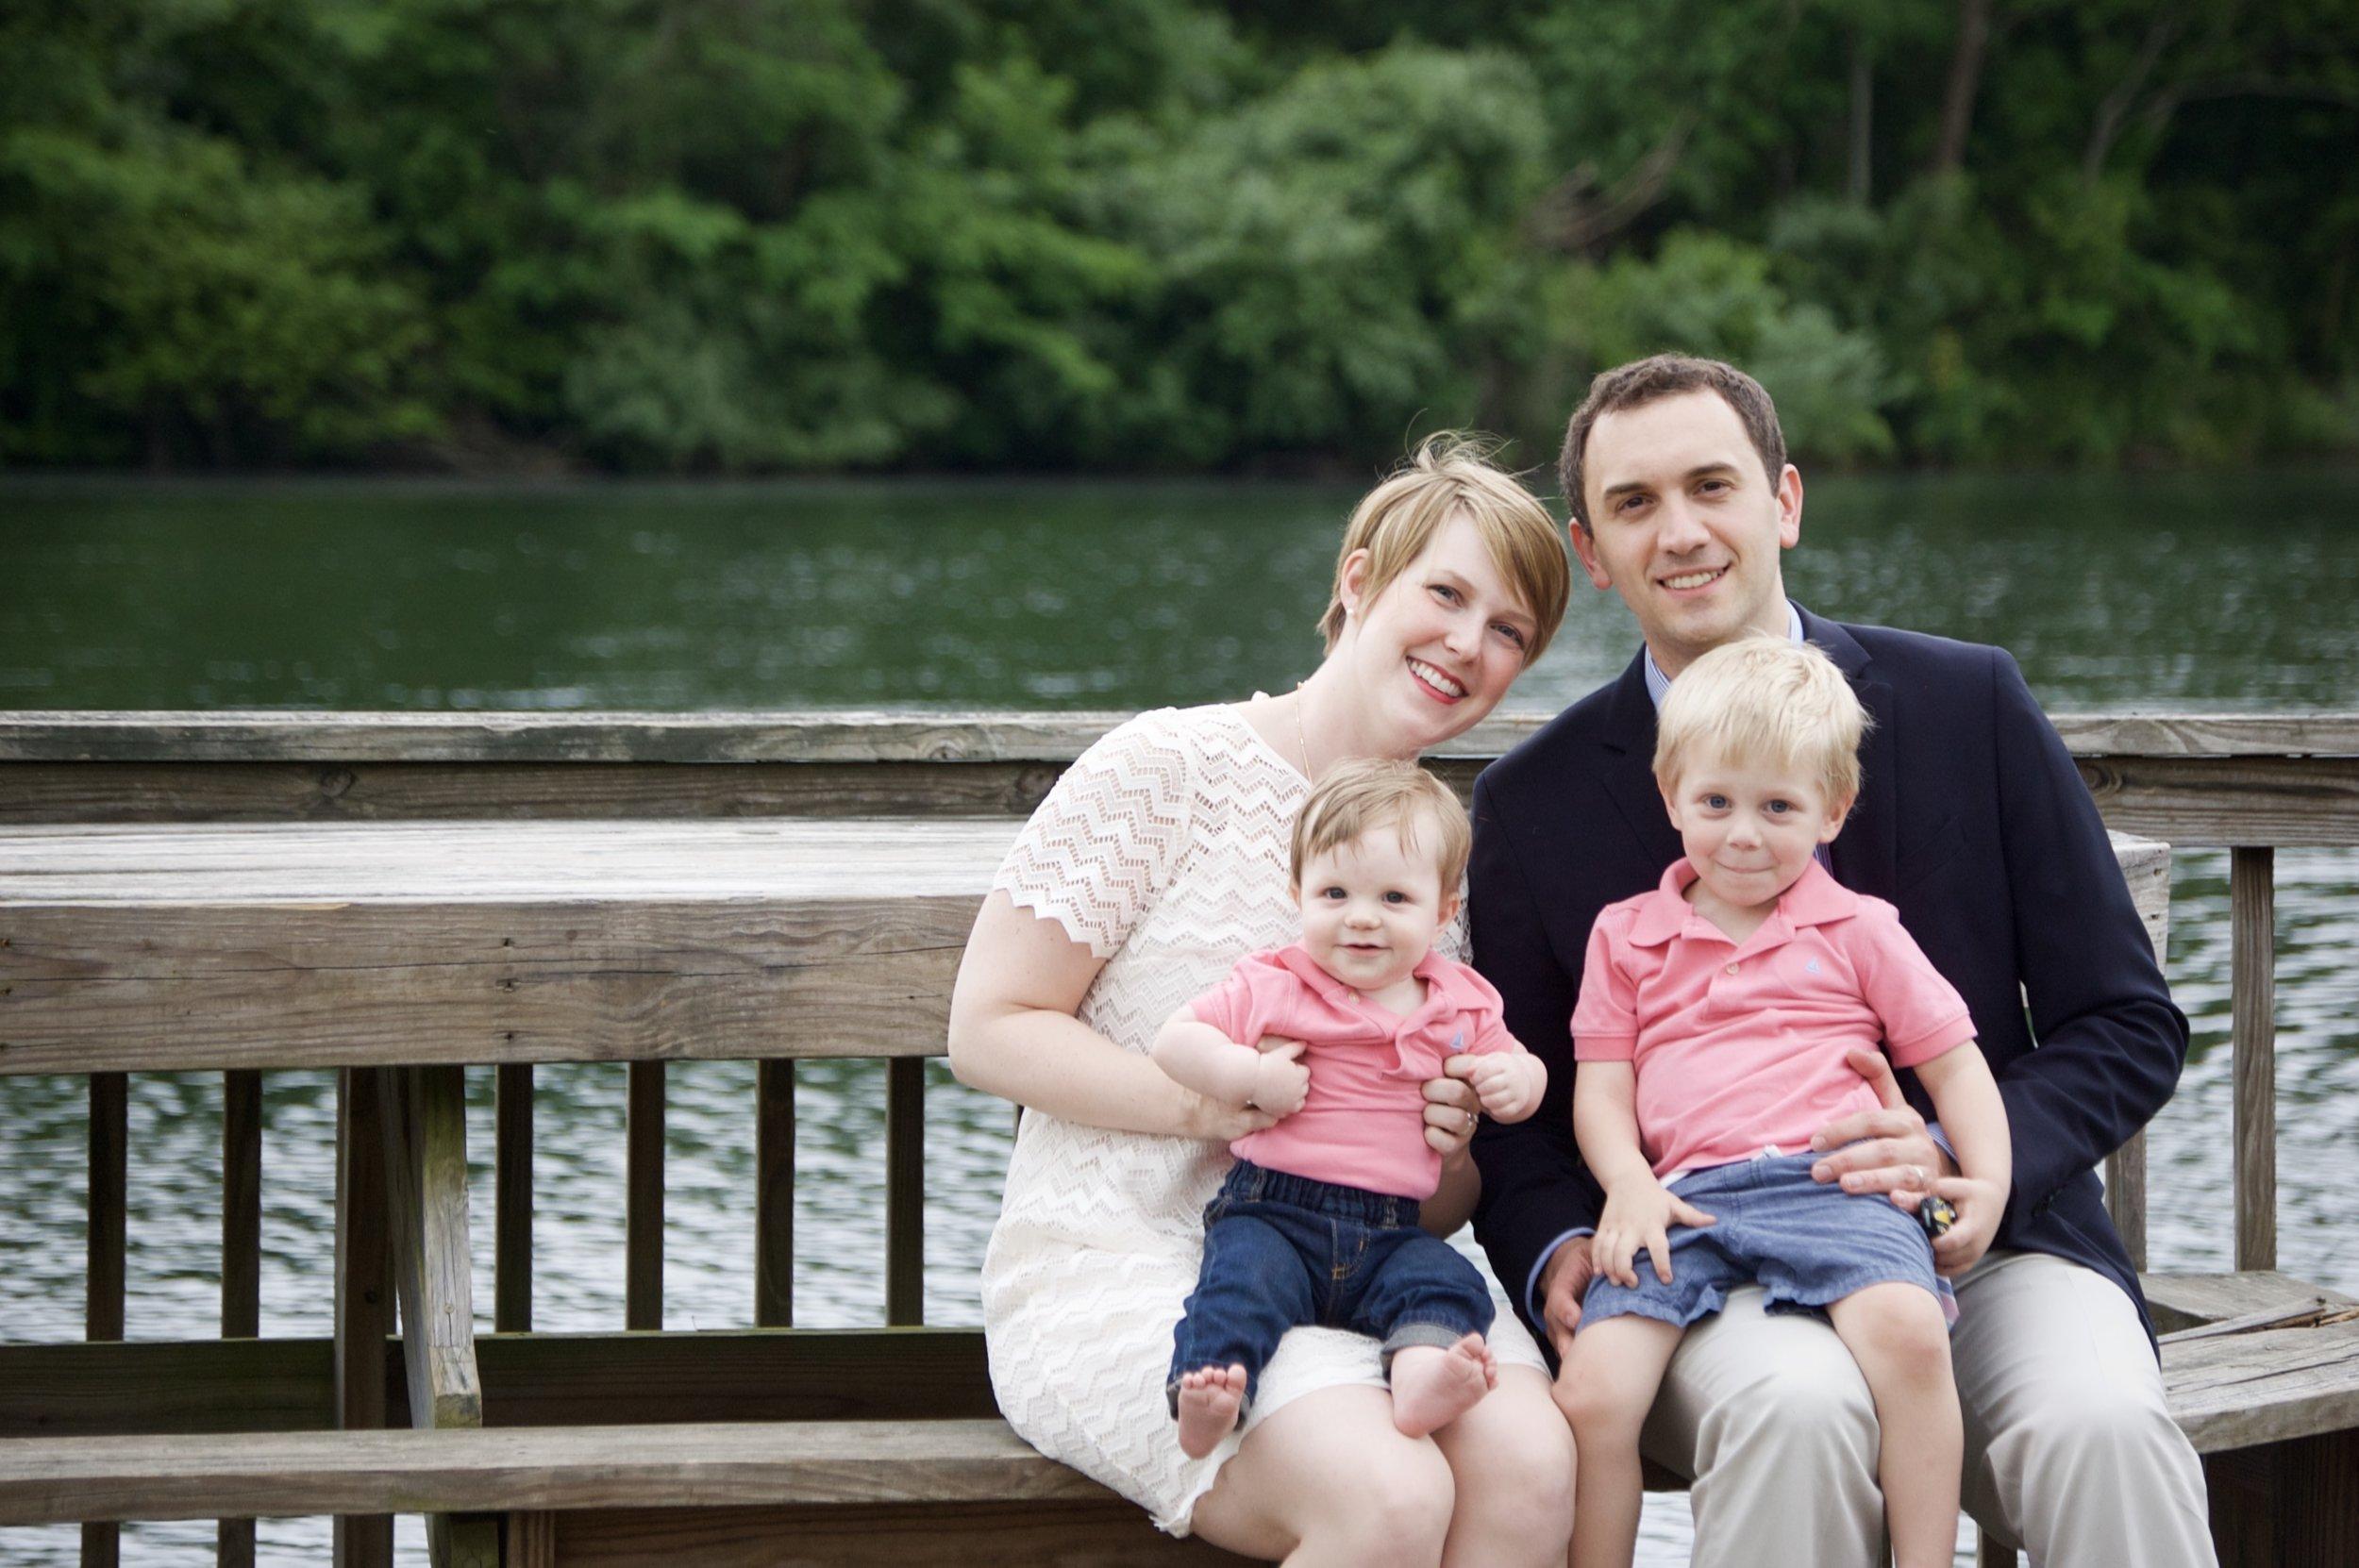 Guarnera Family All Four.jpg